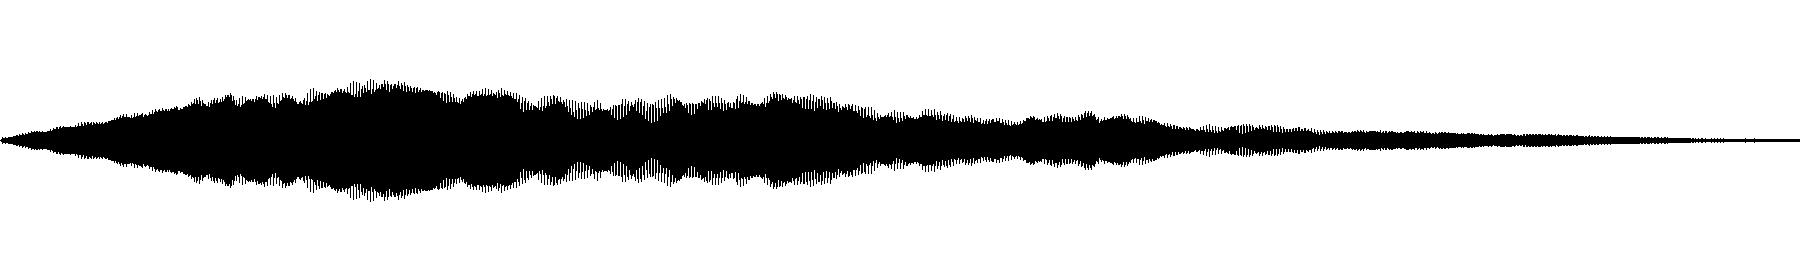 atmos 11